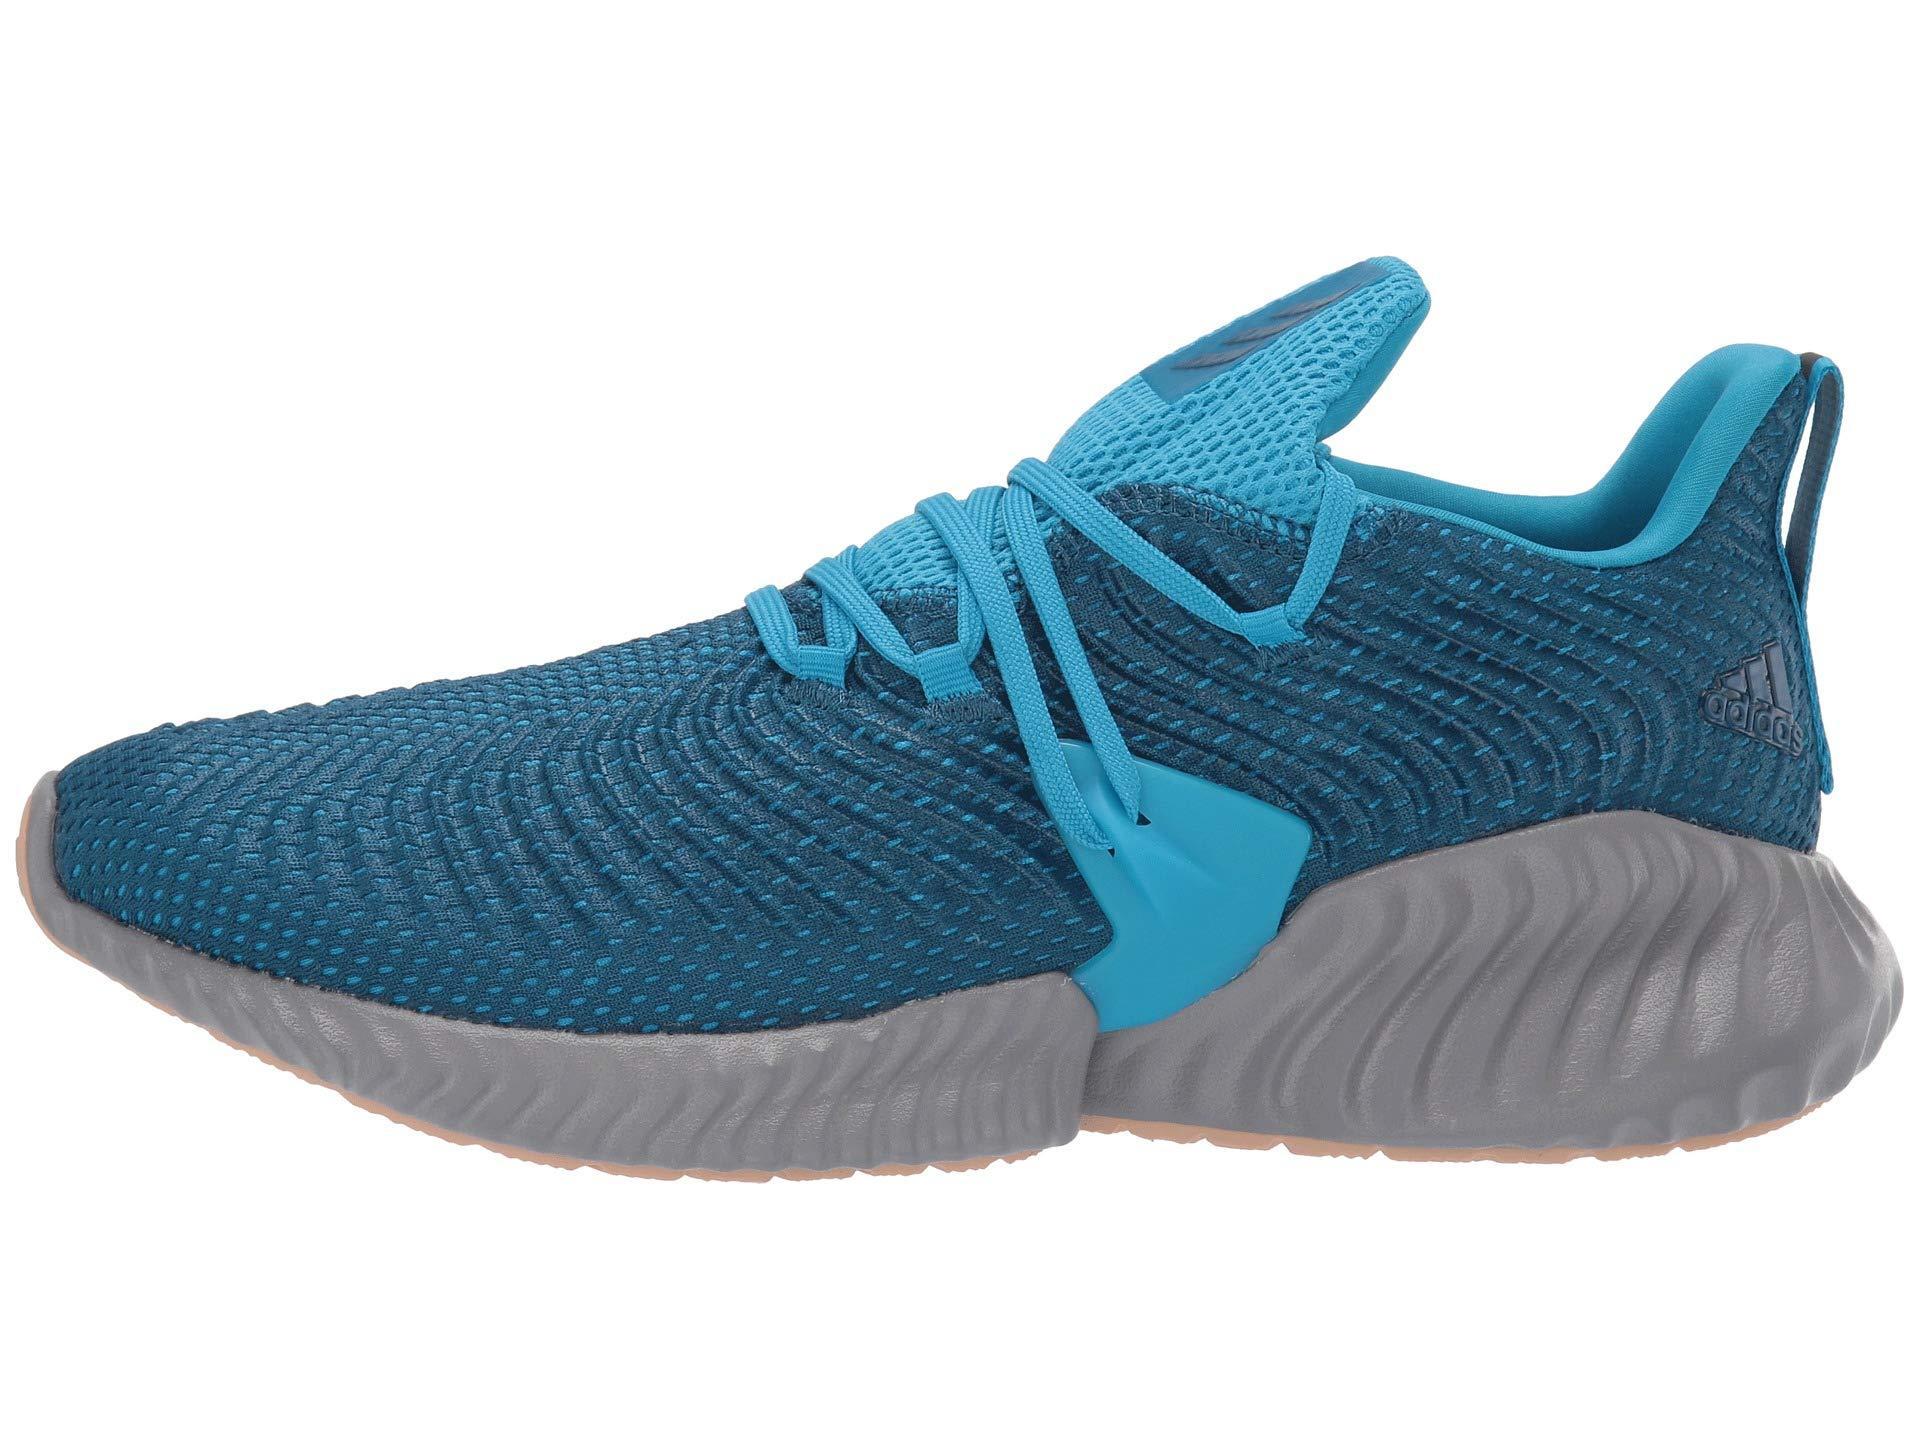 529c01daad49b Lyst - adidas Originals Alphabounce Instinct (legend Marine legend  Marine shock Cyan) Men s Running Shoes in Blue for Men